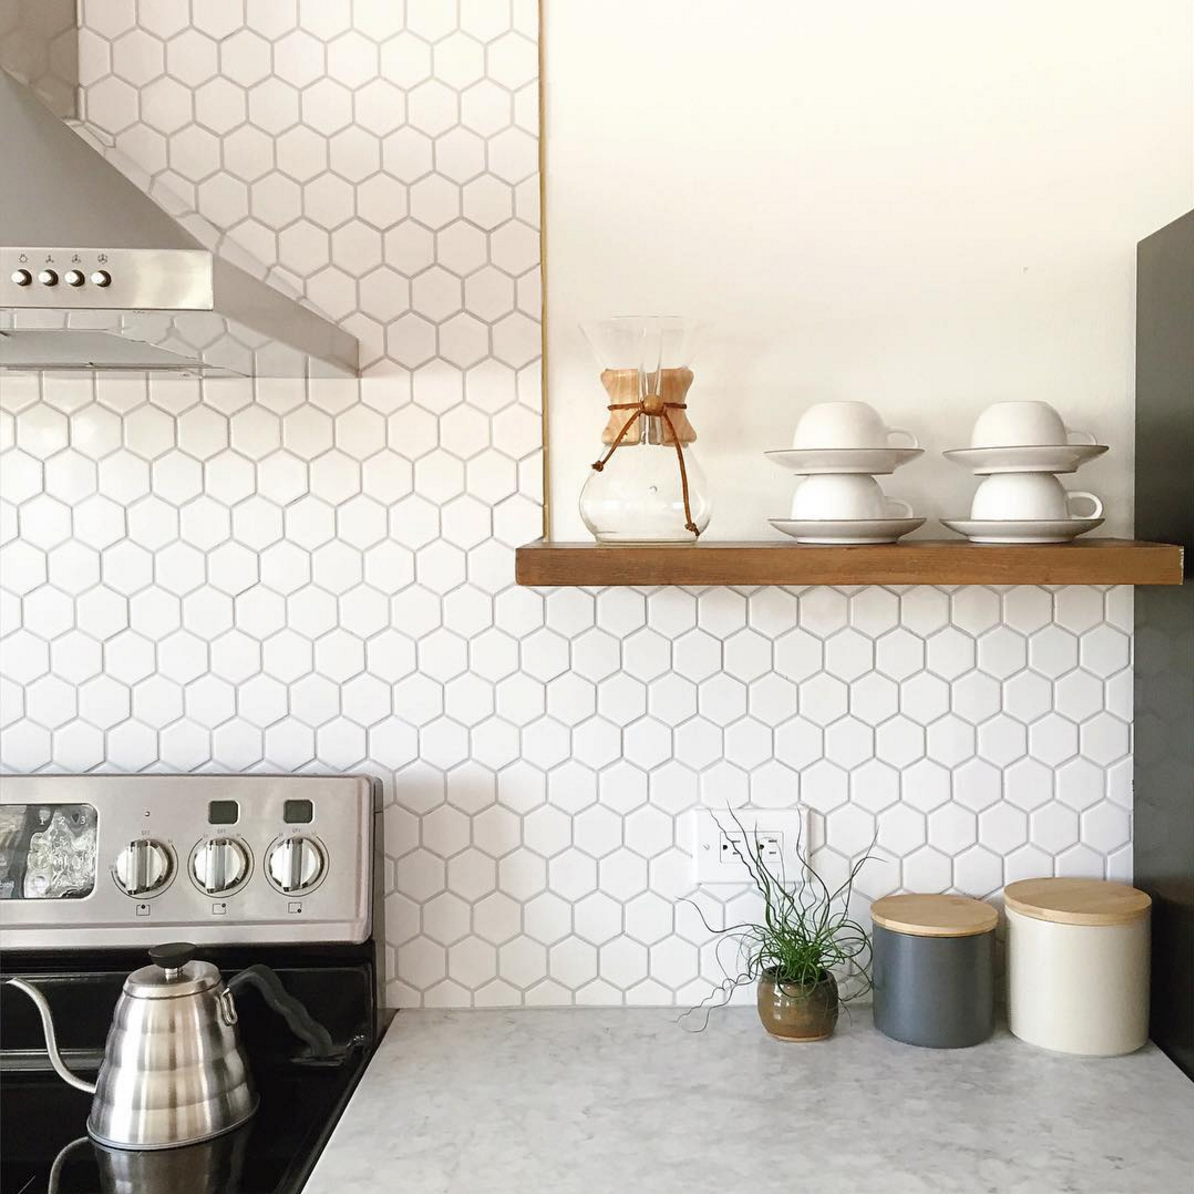 - Honeycomb Tile Kitchen Kök Klinker Vackra Och In 2020 Kitchen